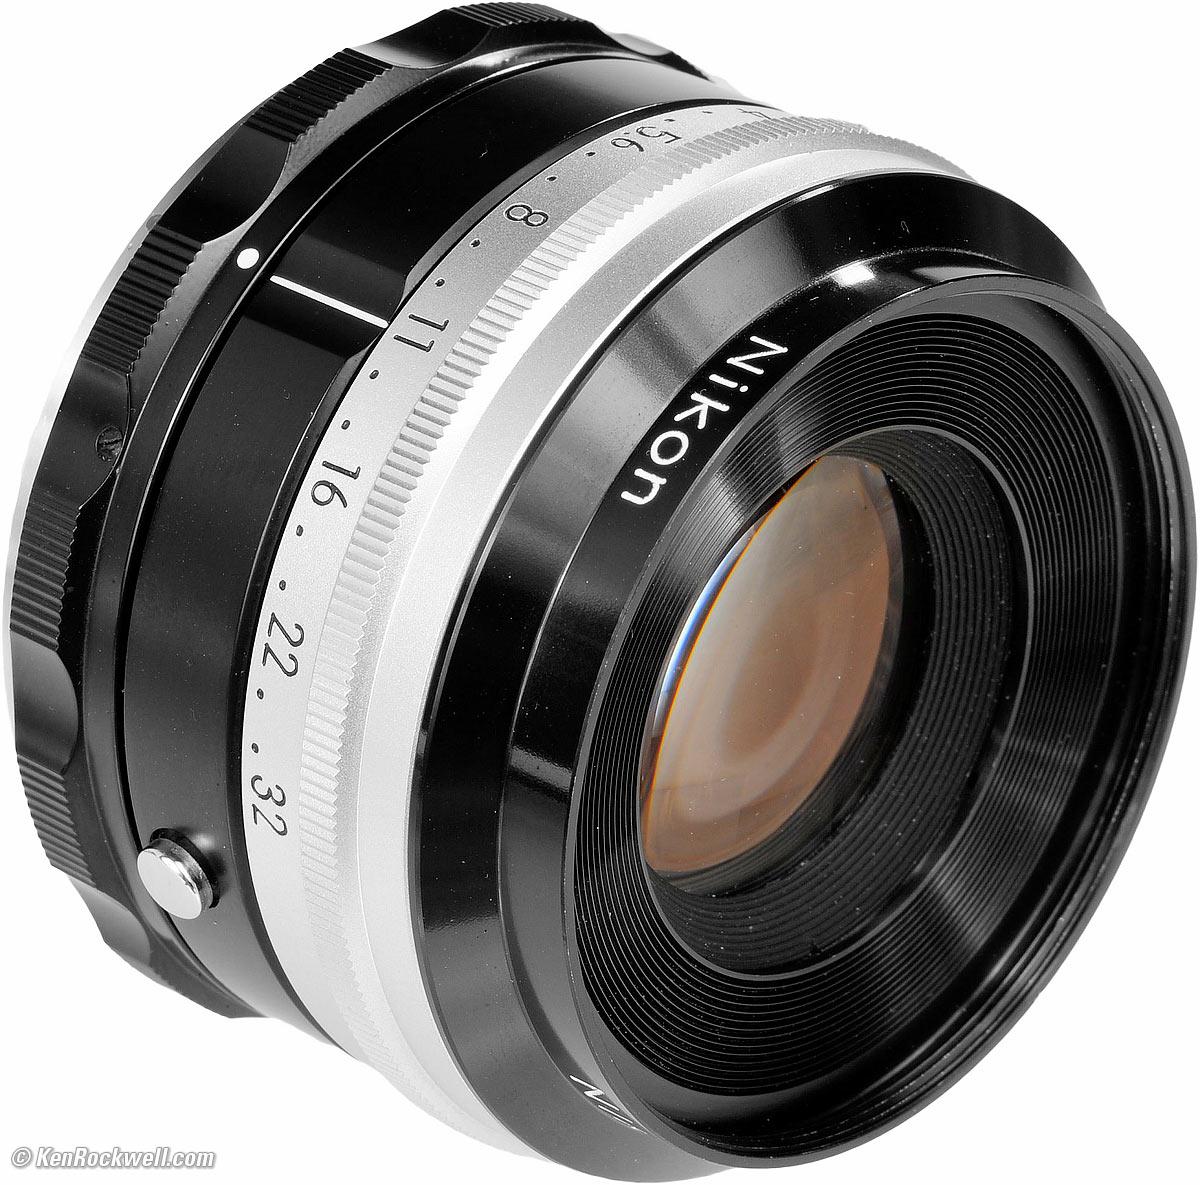 Nikon 105mm f/4 Micro-NIKKOR (1970-1983)